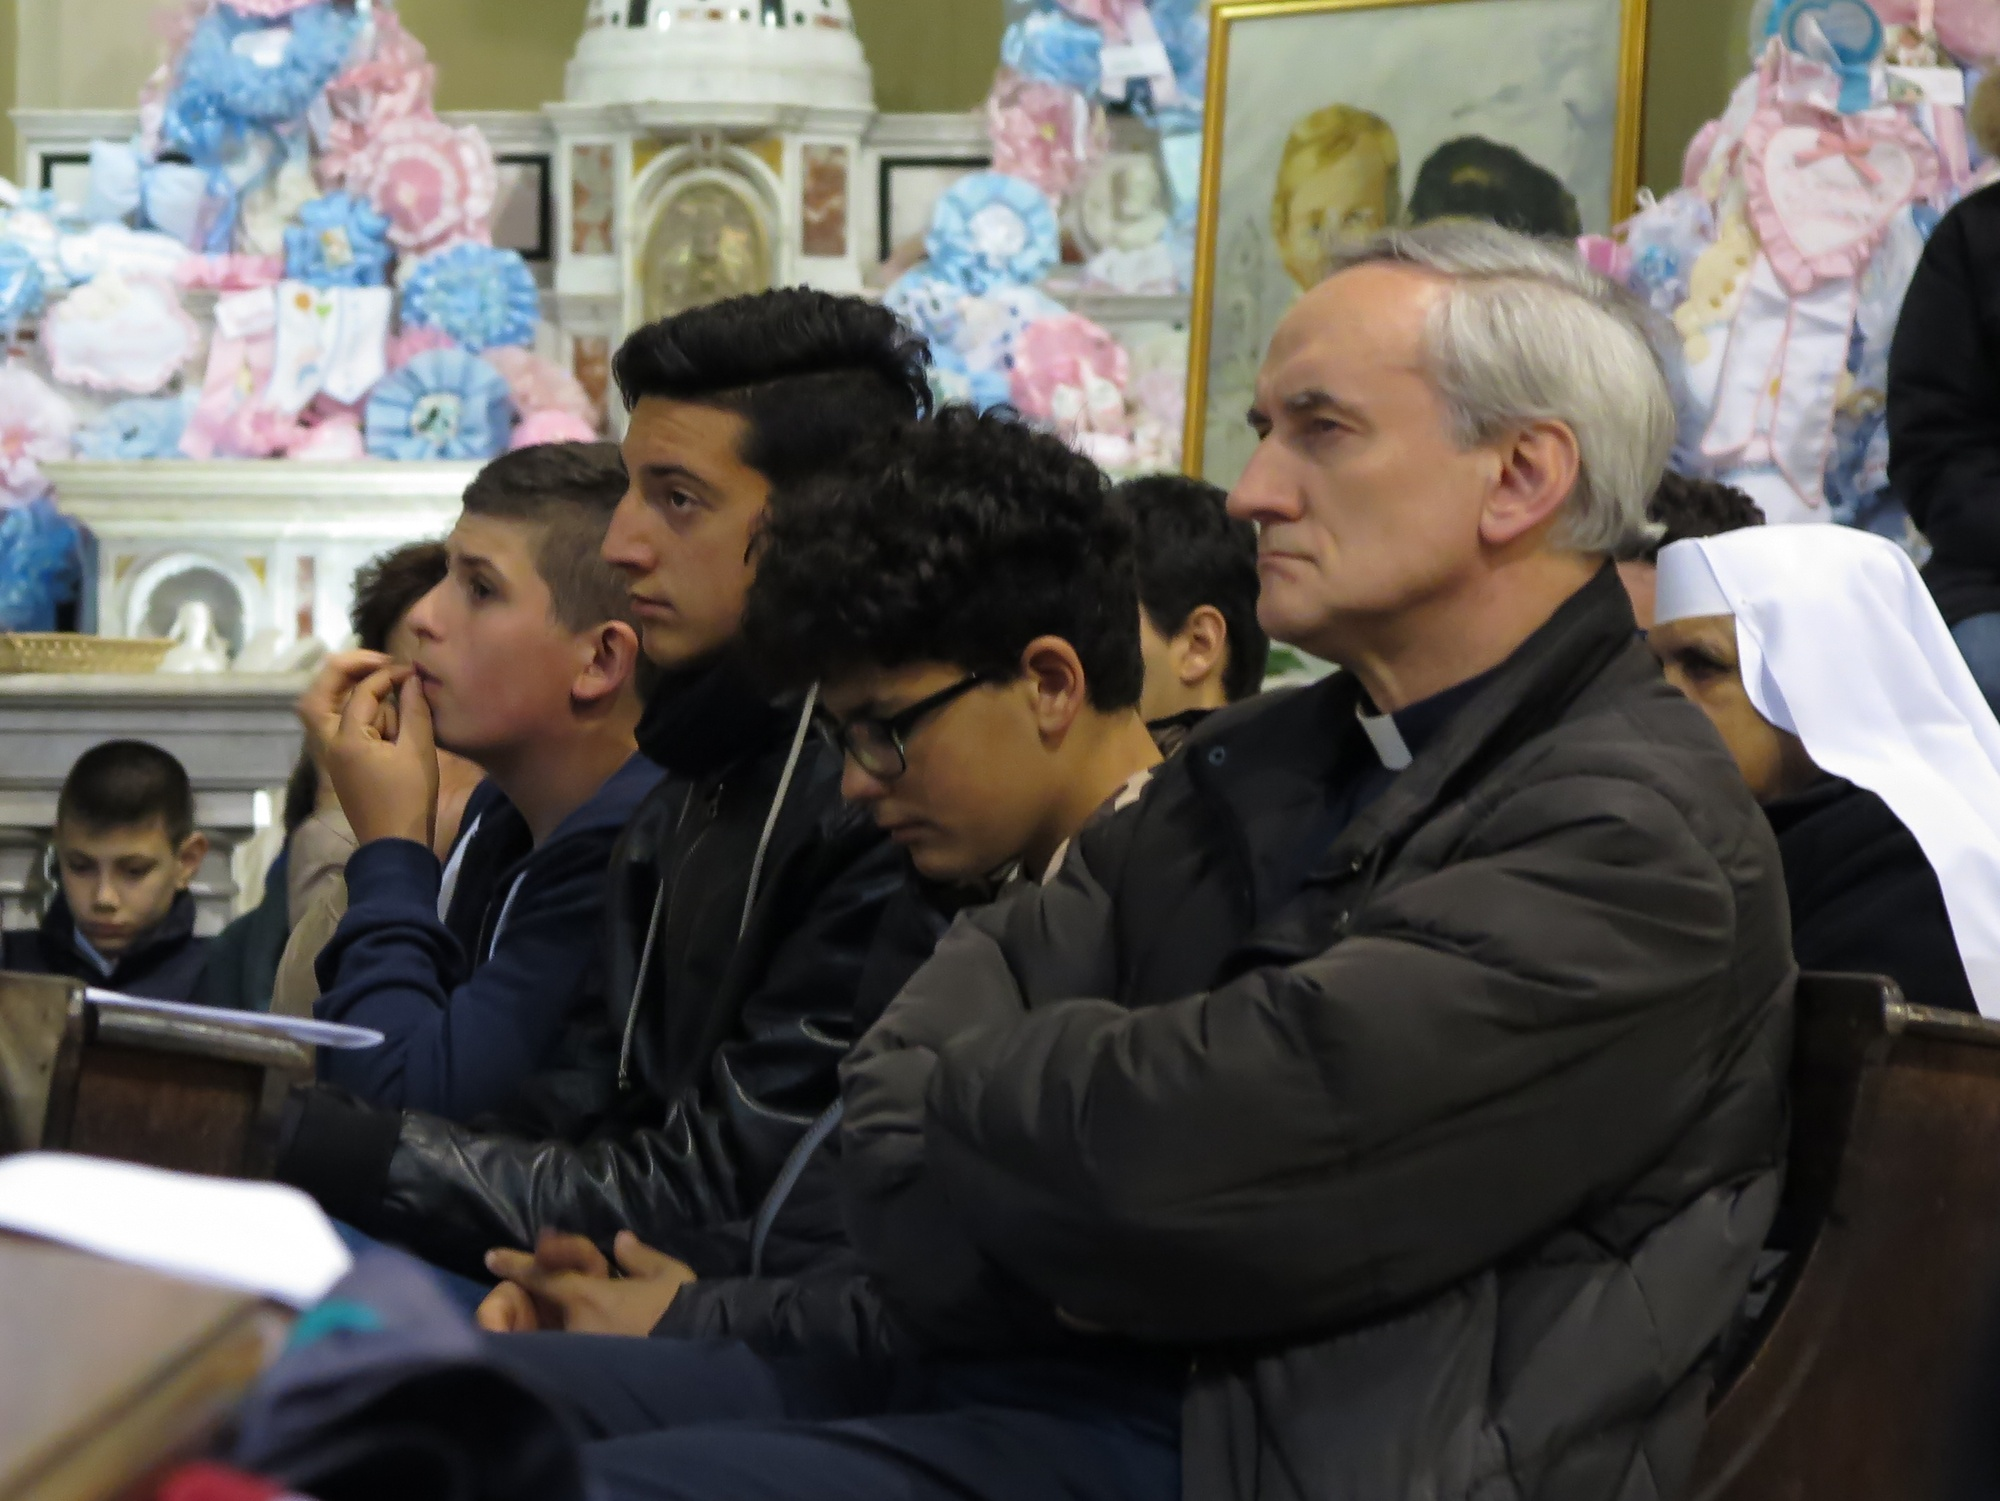 guardia-giovani-pentecoste-2016-05-14-21-35-22